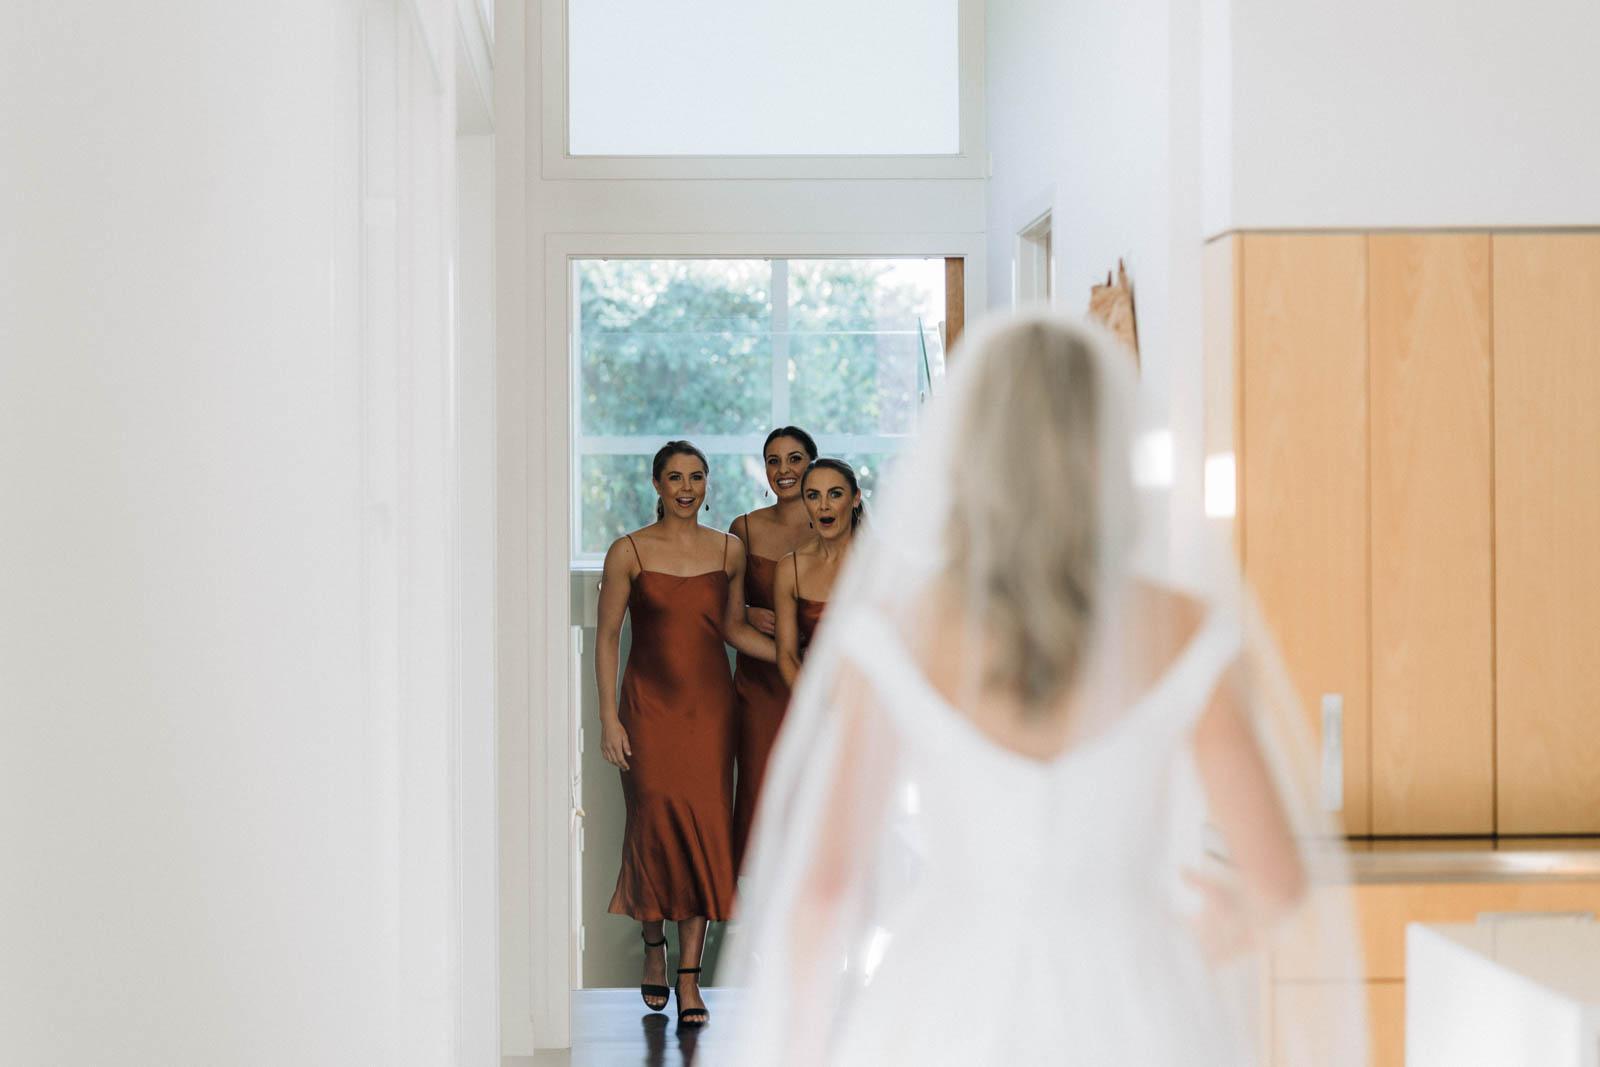 newfound-s-p-mt-maunganui-tauranga-wedding-photographer-1411-A9_04469